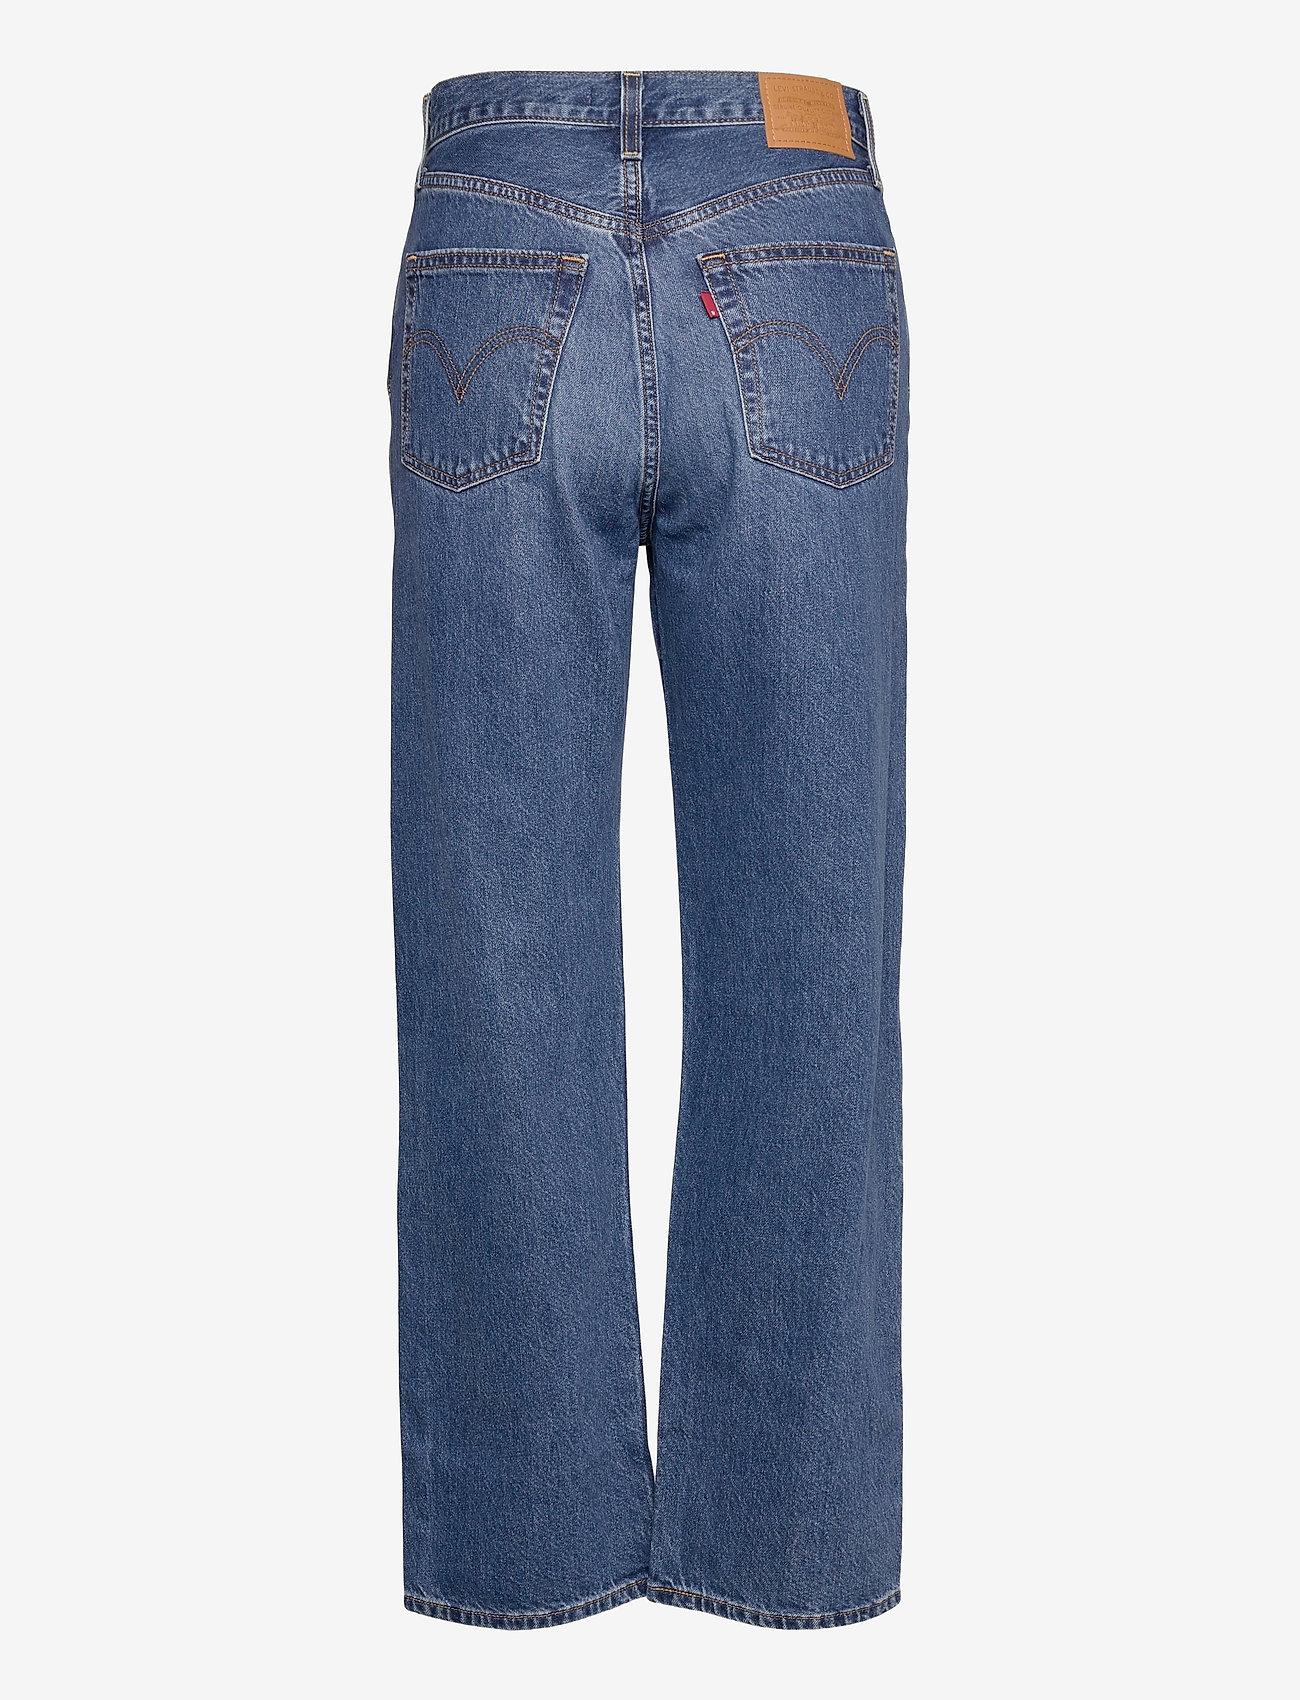 LEVI´S Women - RIBCAGE STRAIGHT ANKLE NOE FOG - brede jeans - dark indigo - worn in - 1